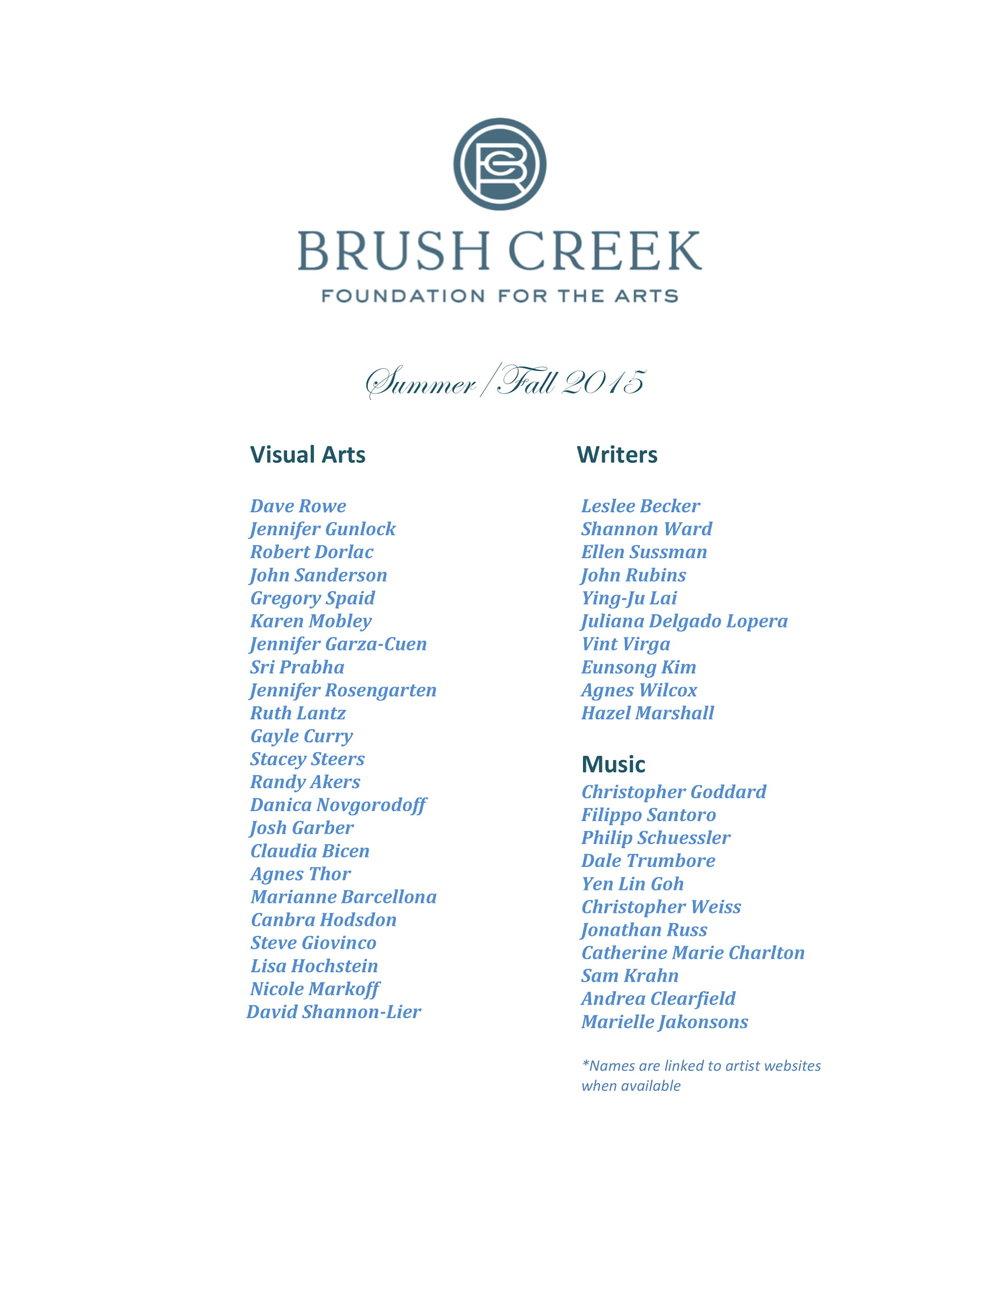 05-01-2015_Artist-in-Residence, Brush Creek Foundation for the Arts_Brush Creek Ranch, Wyoming.jpg